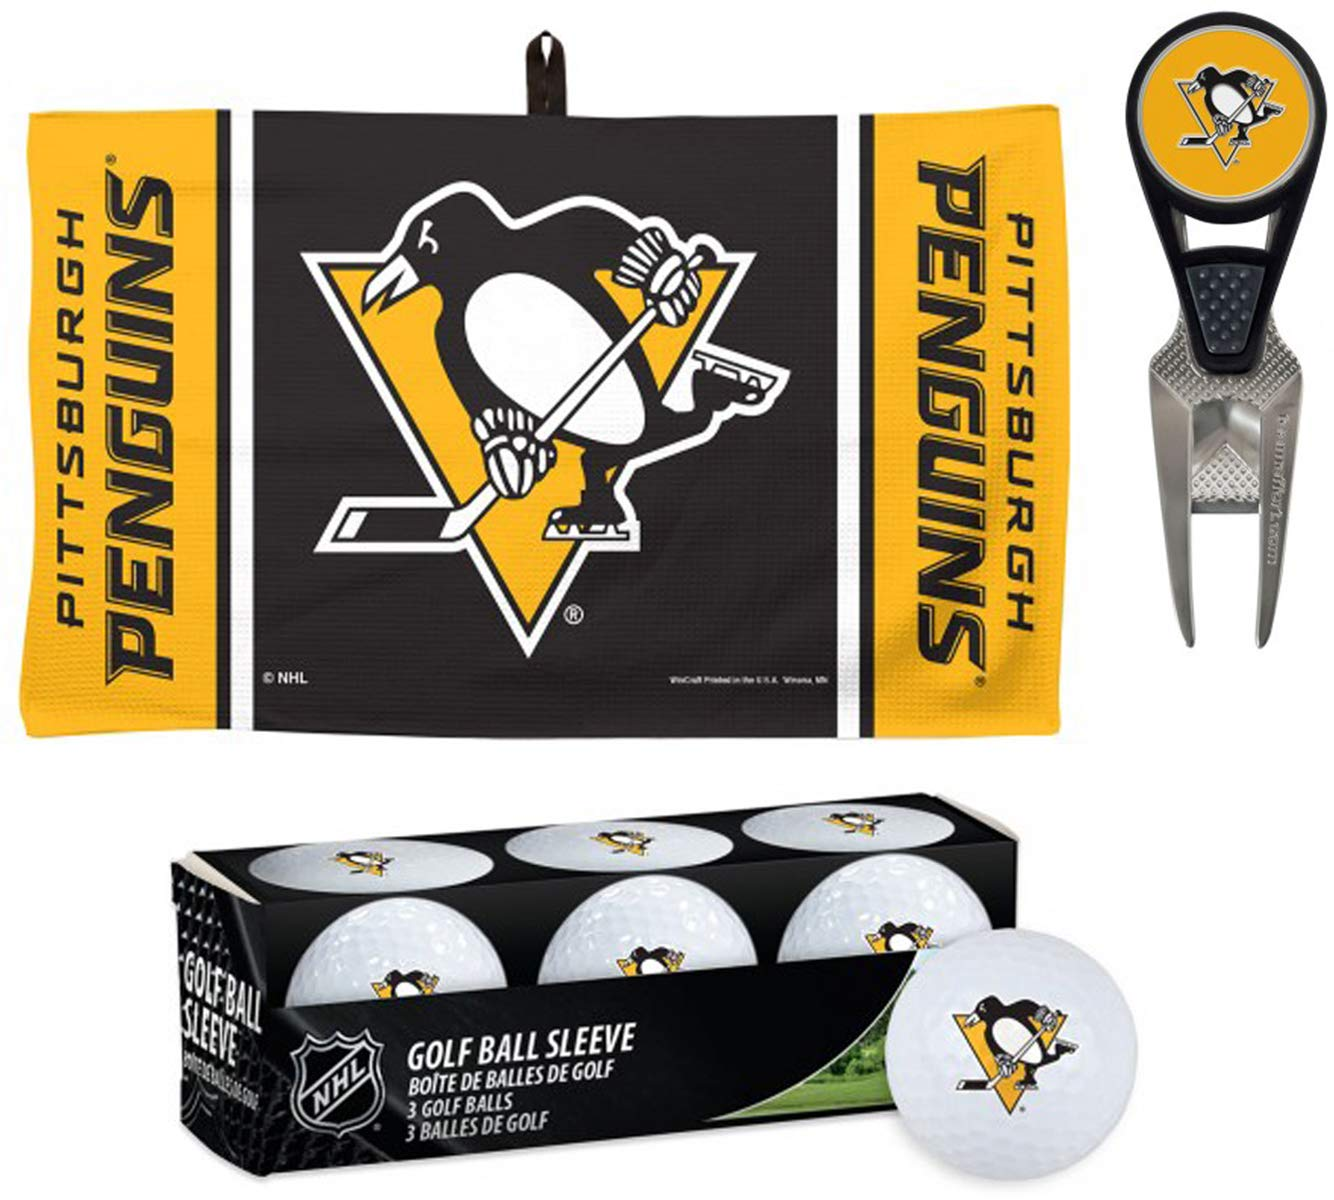 WinCraft Bundle 3 Items NHL Pittsburgh Penguins 1 Golf Waffle Towel 14x24 1 CVX Divot Tool and 1 Sleeve of 3 Golf Balls